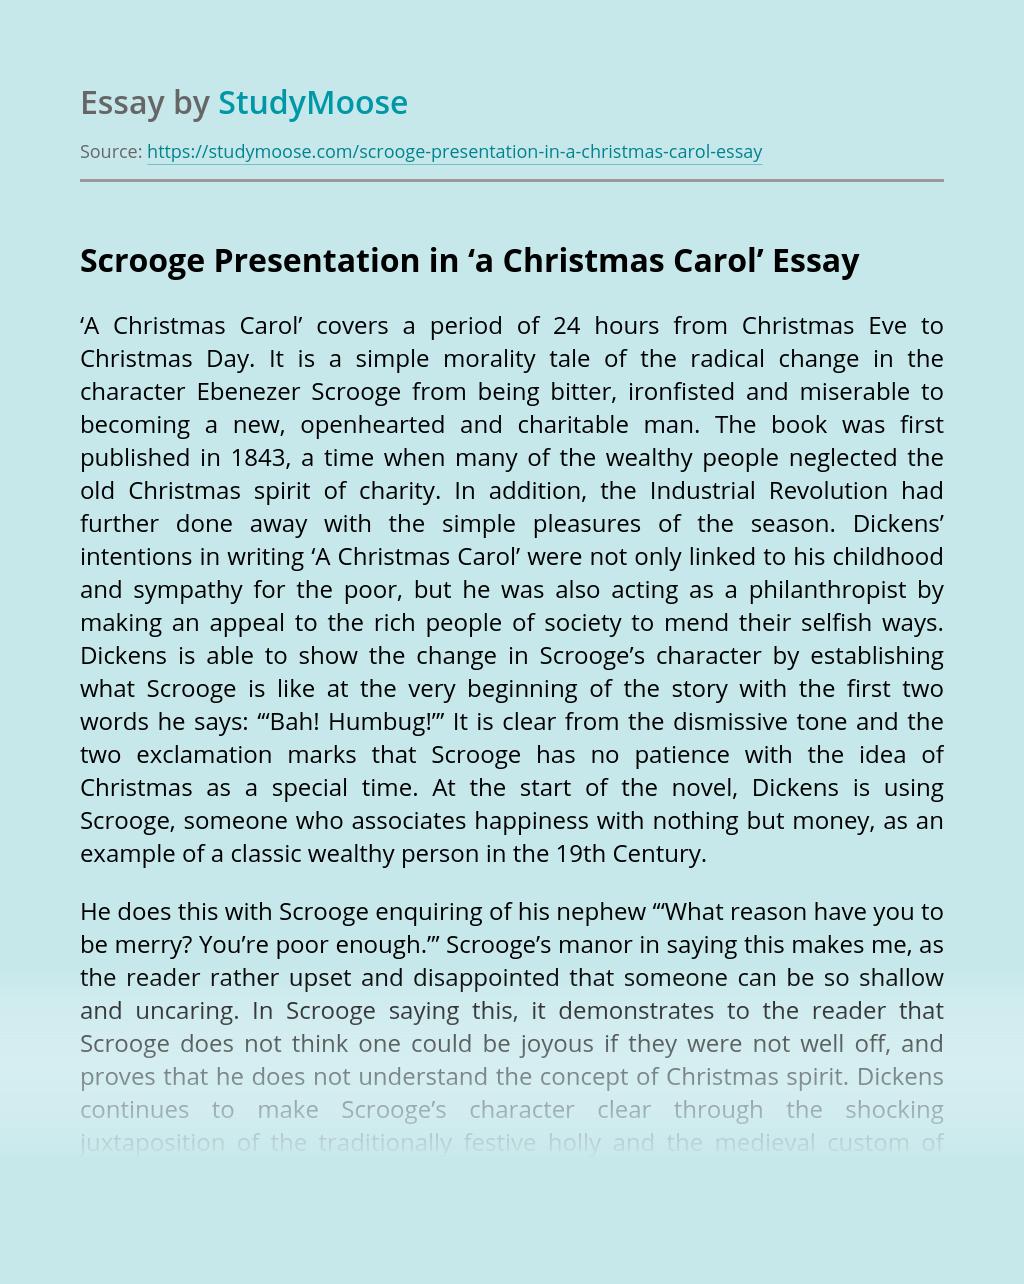 Scrooge Presentation in 'a Christmas Carol'